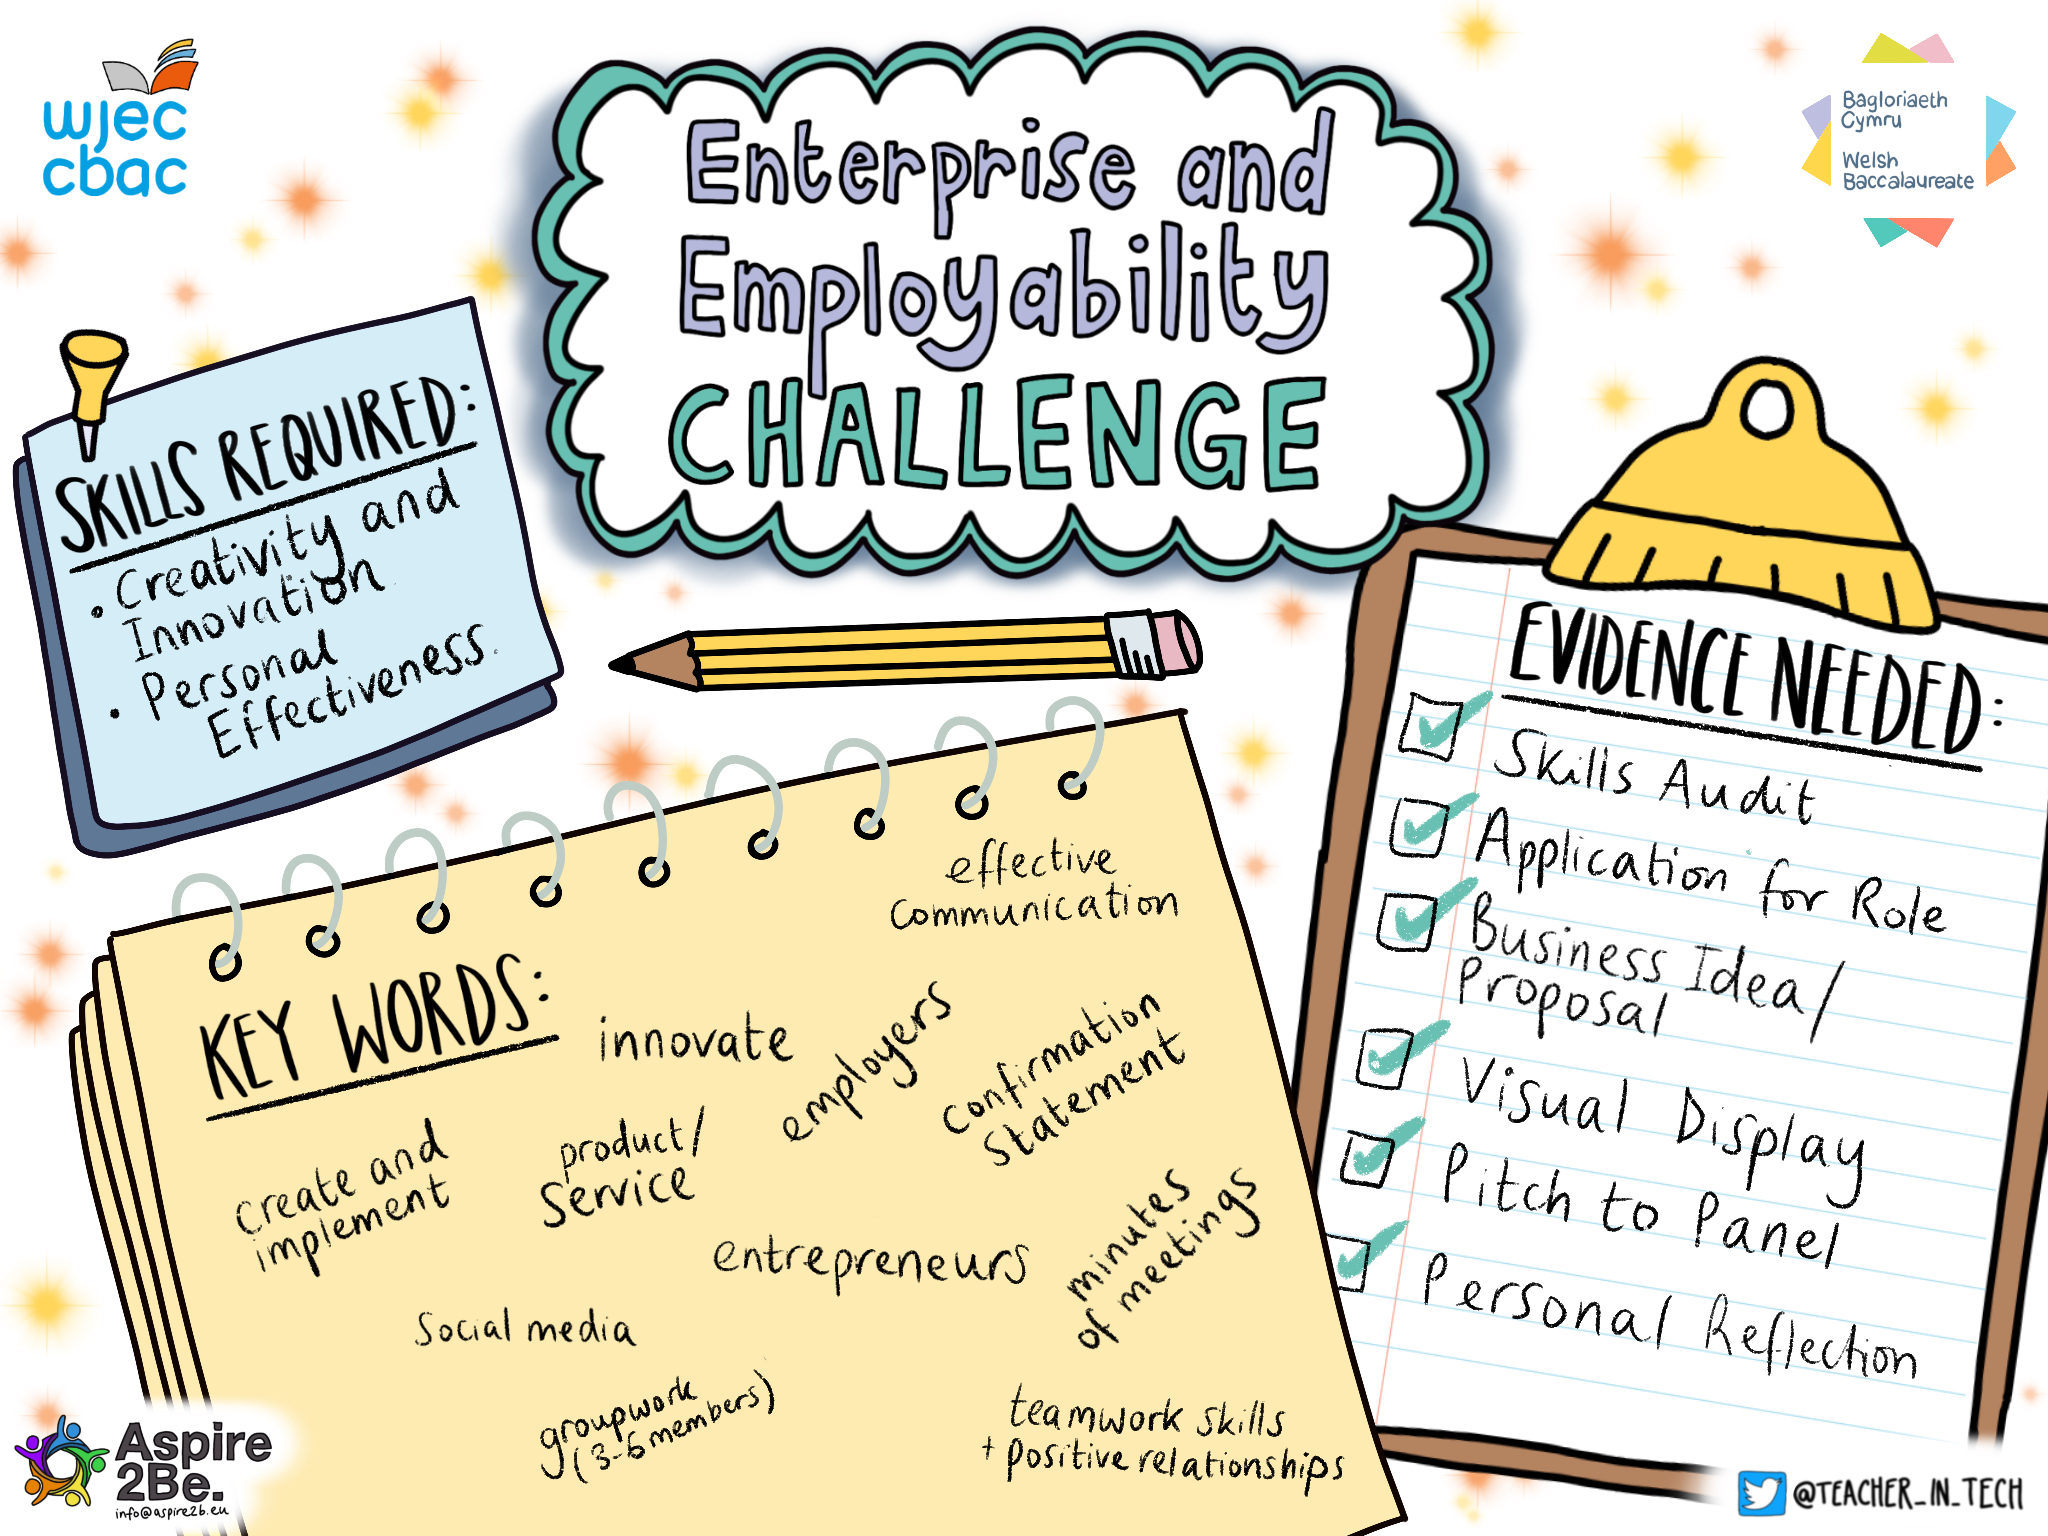 Enterprise+Challenge